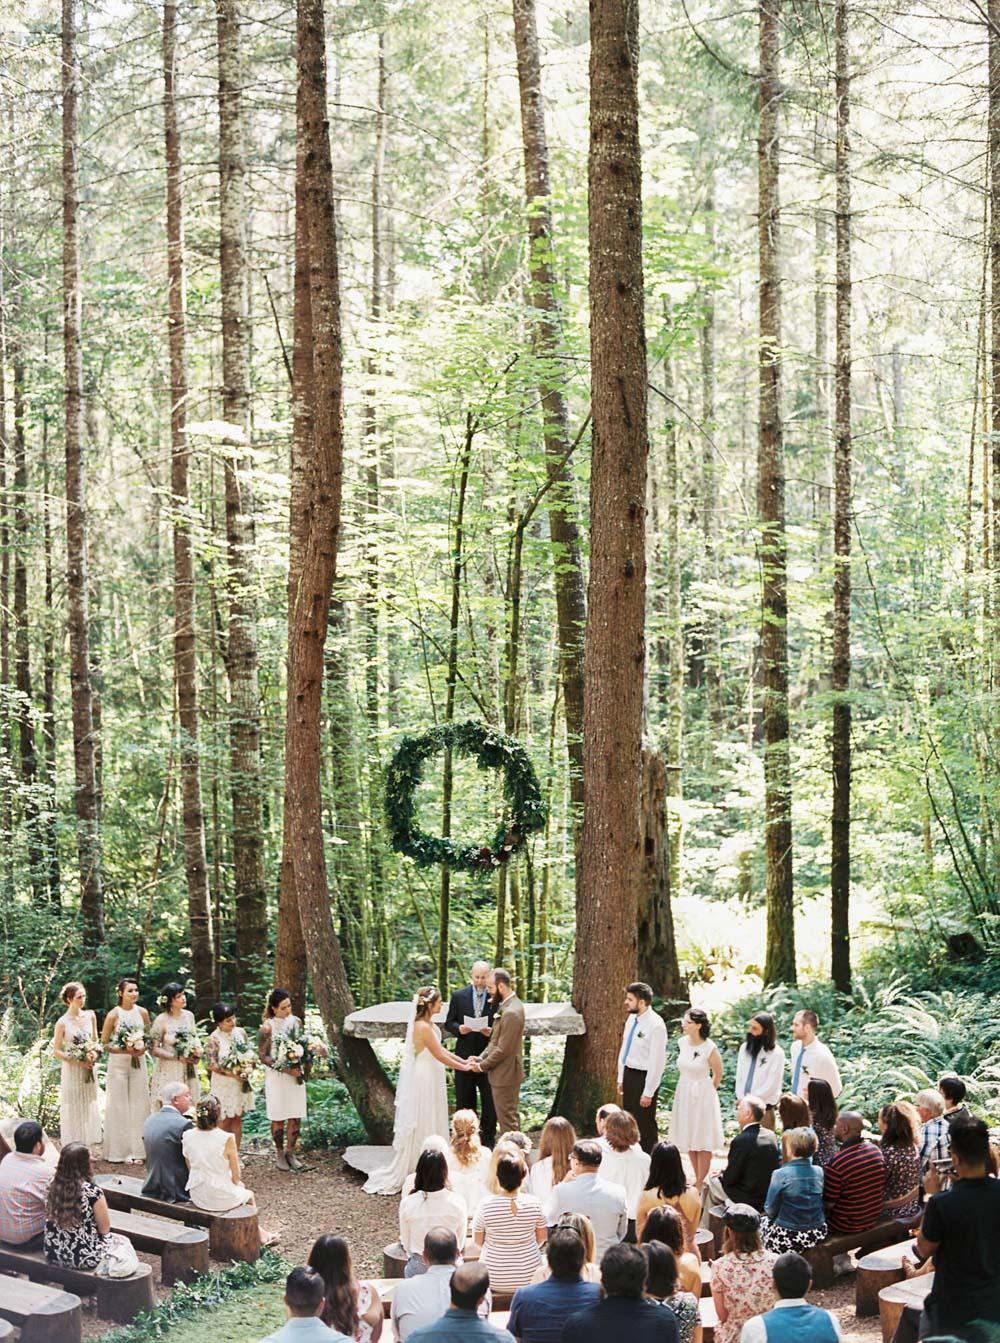 Wellspring Spa Wedding ceremony at Mt. Rainier captured by Seattle Wedding Photographer Anna Peters